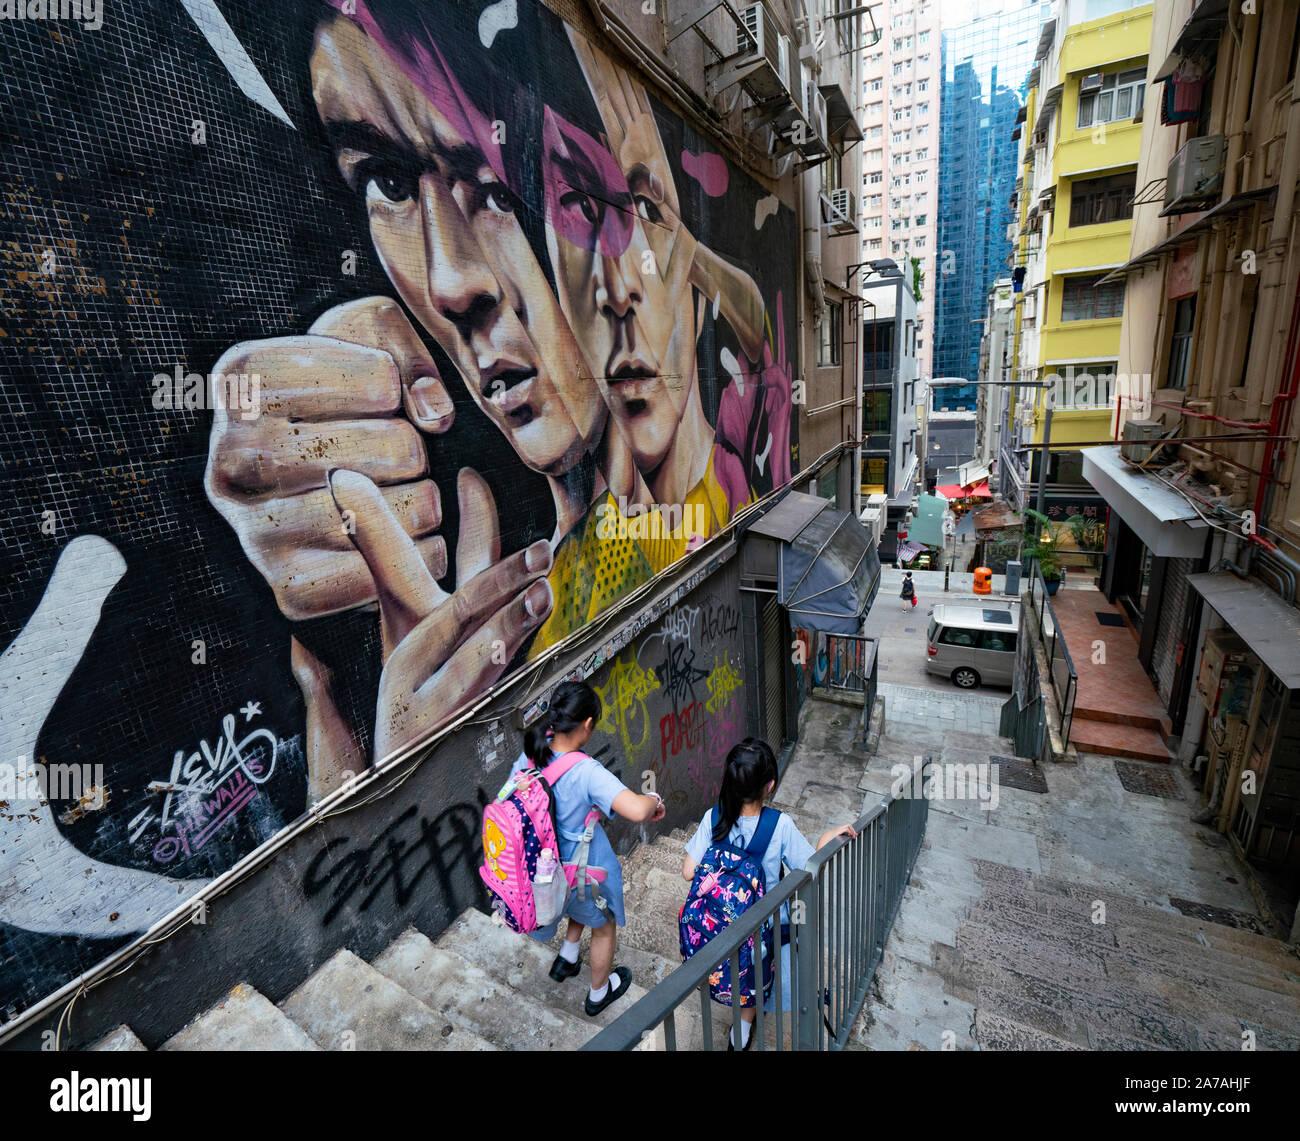 Street art of Bruce Lee by Xeva on  wall at Tank Lane in Sheung Wan Hong Kong, China Stock Photo